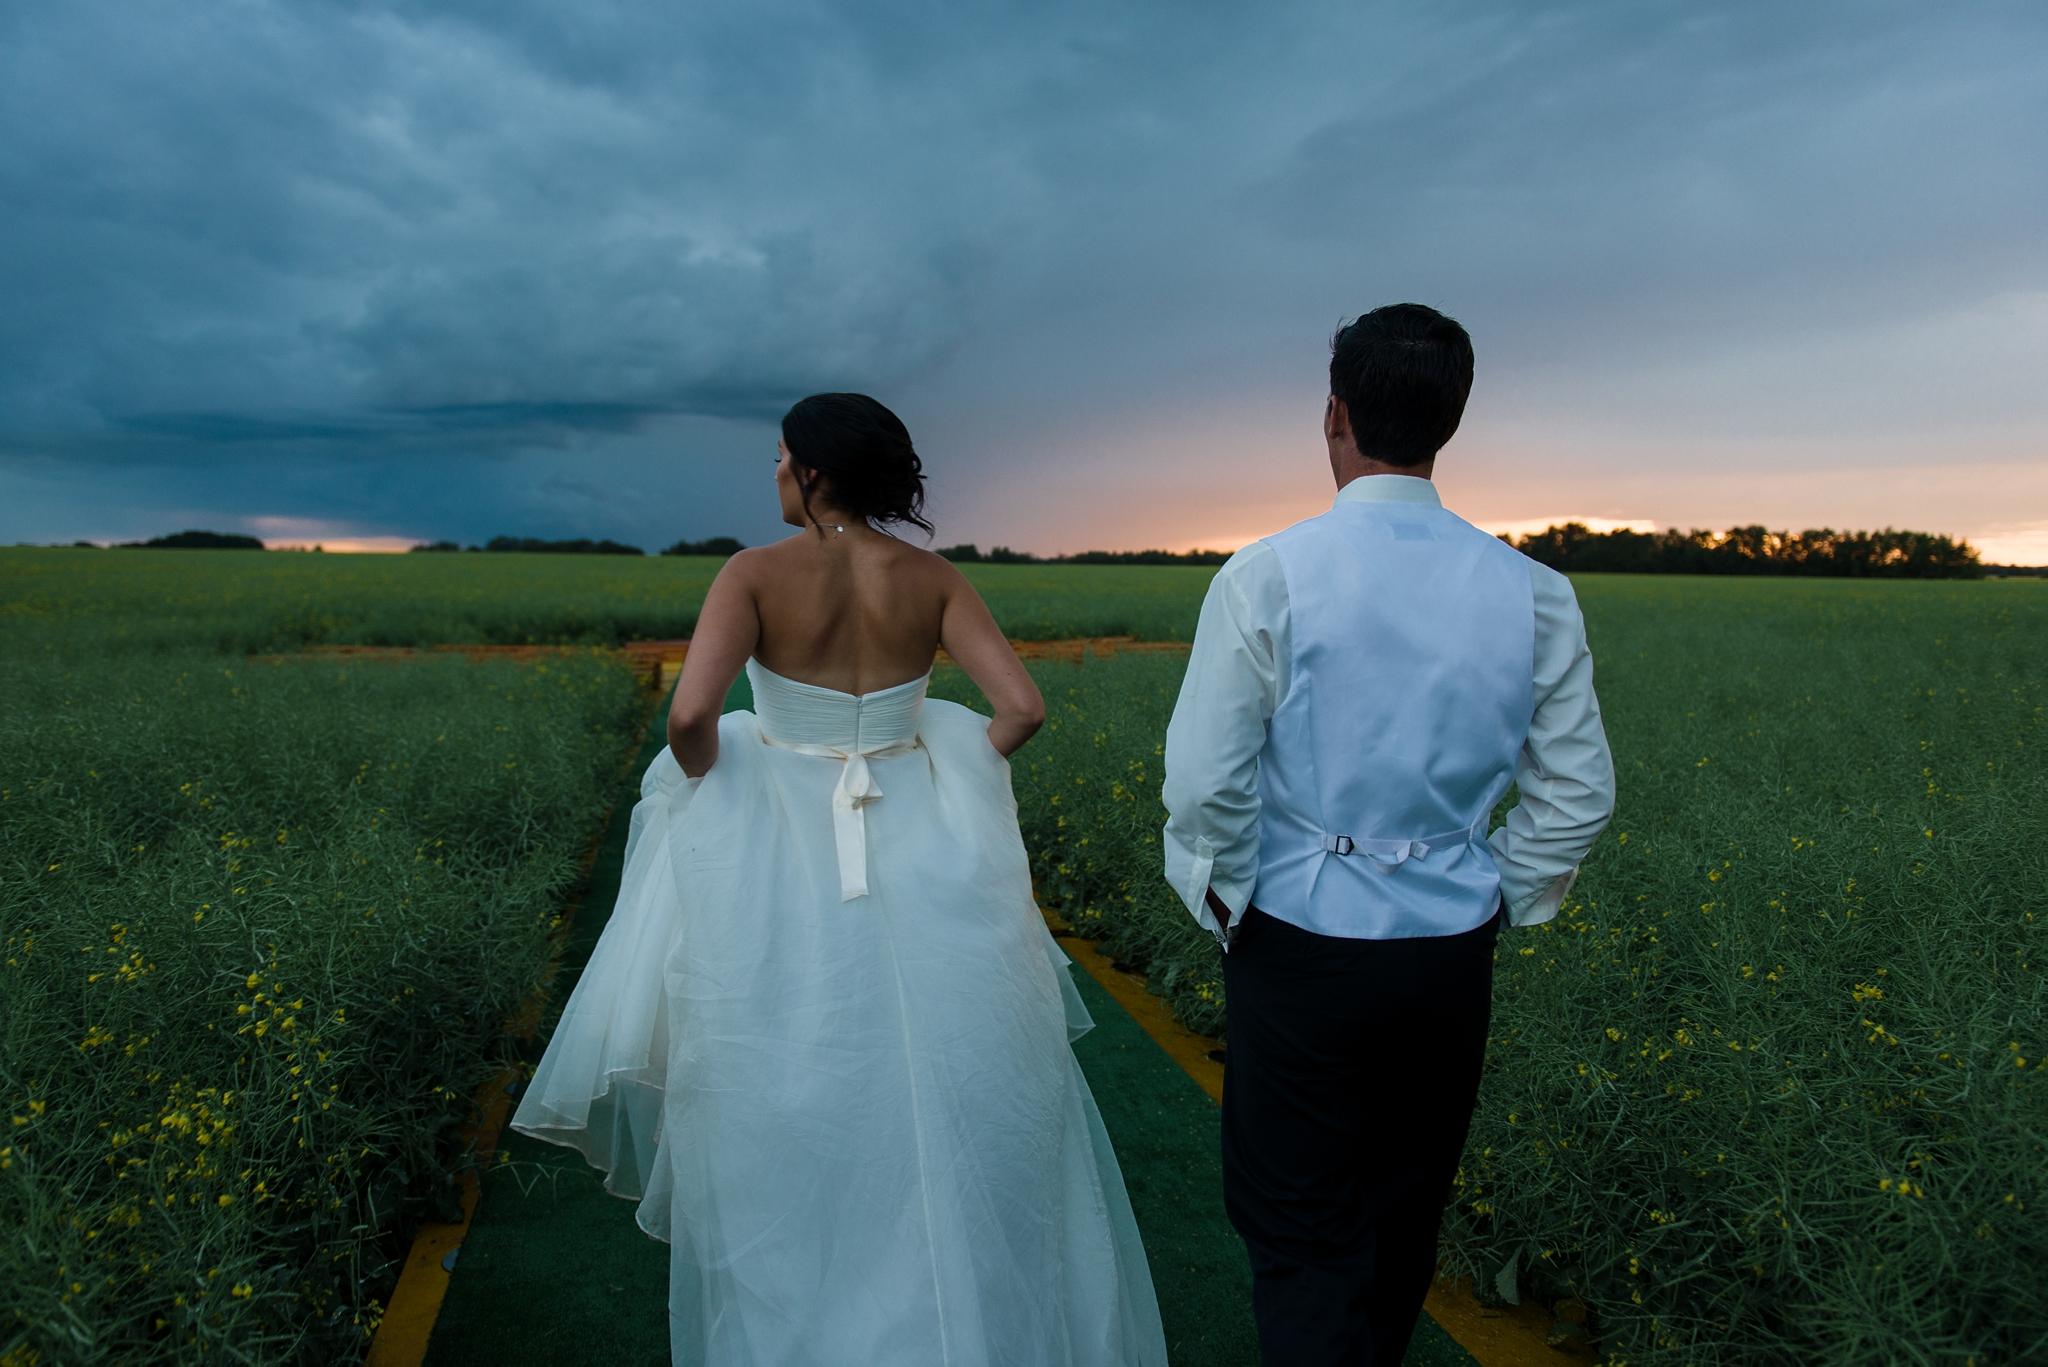 kaihla_tonai_intimate_wedding_elopement_photographer_0112